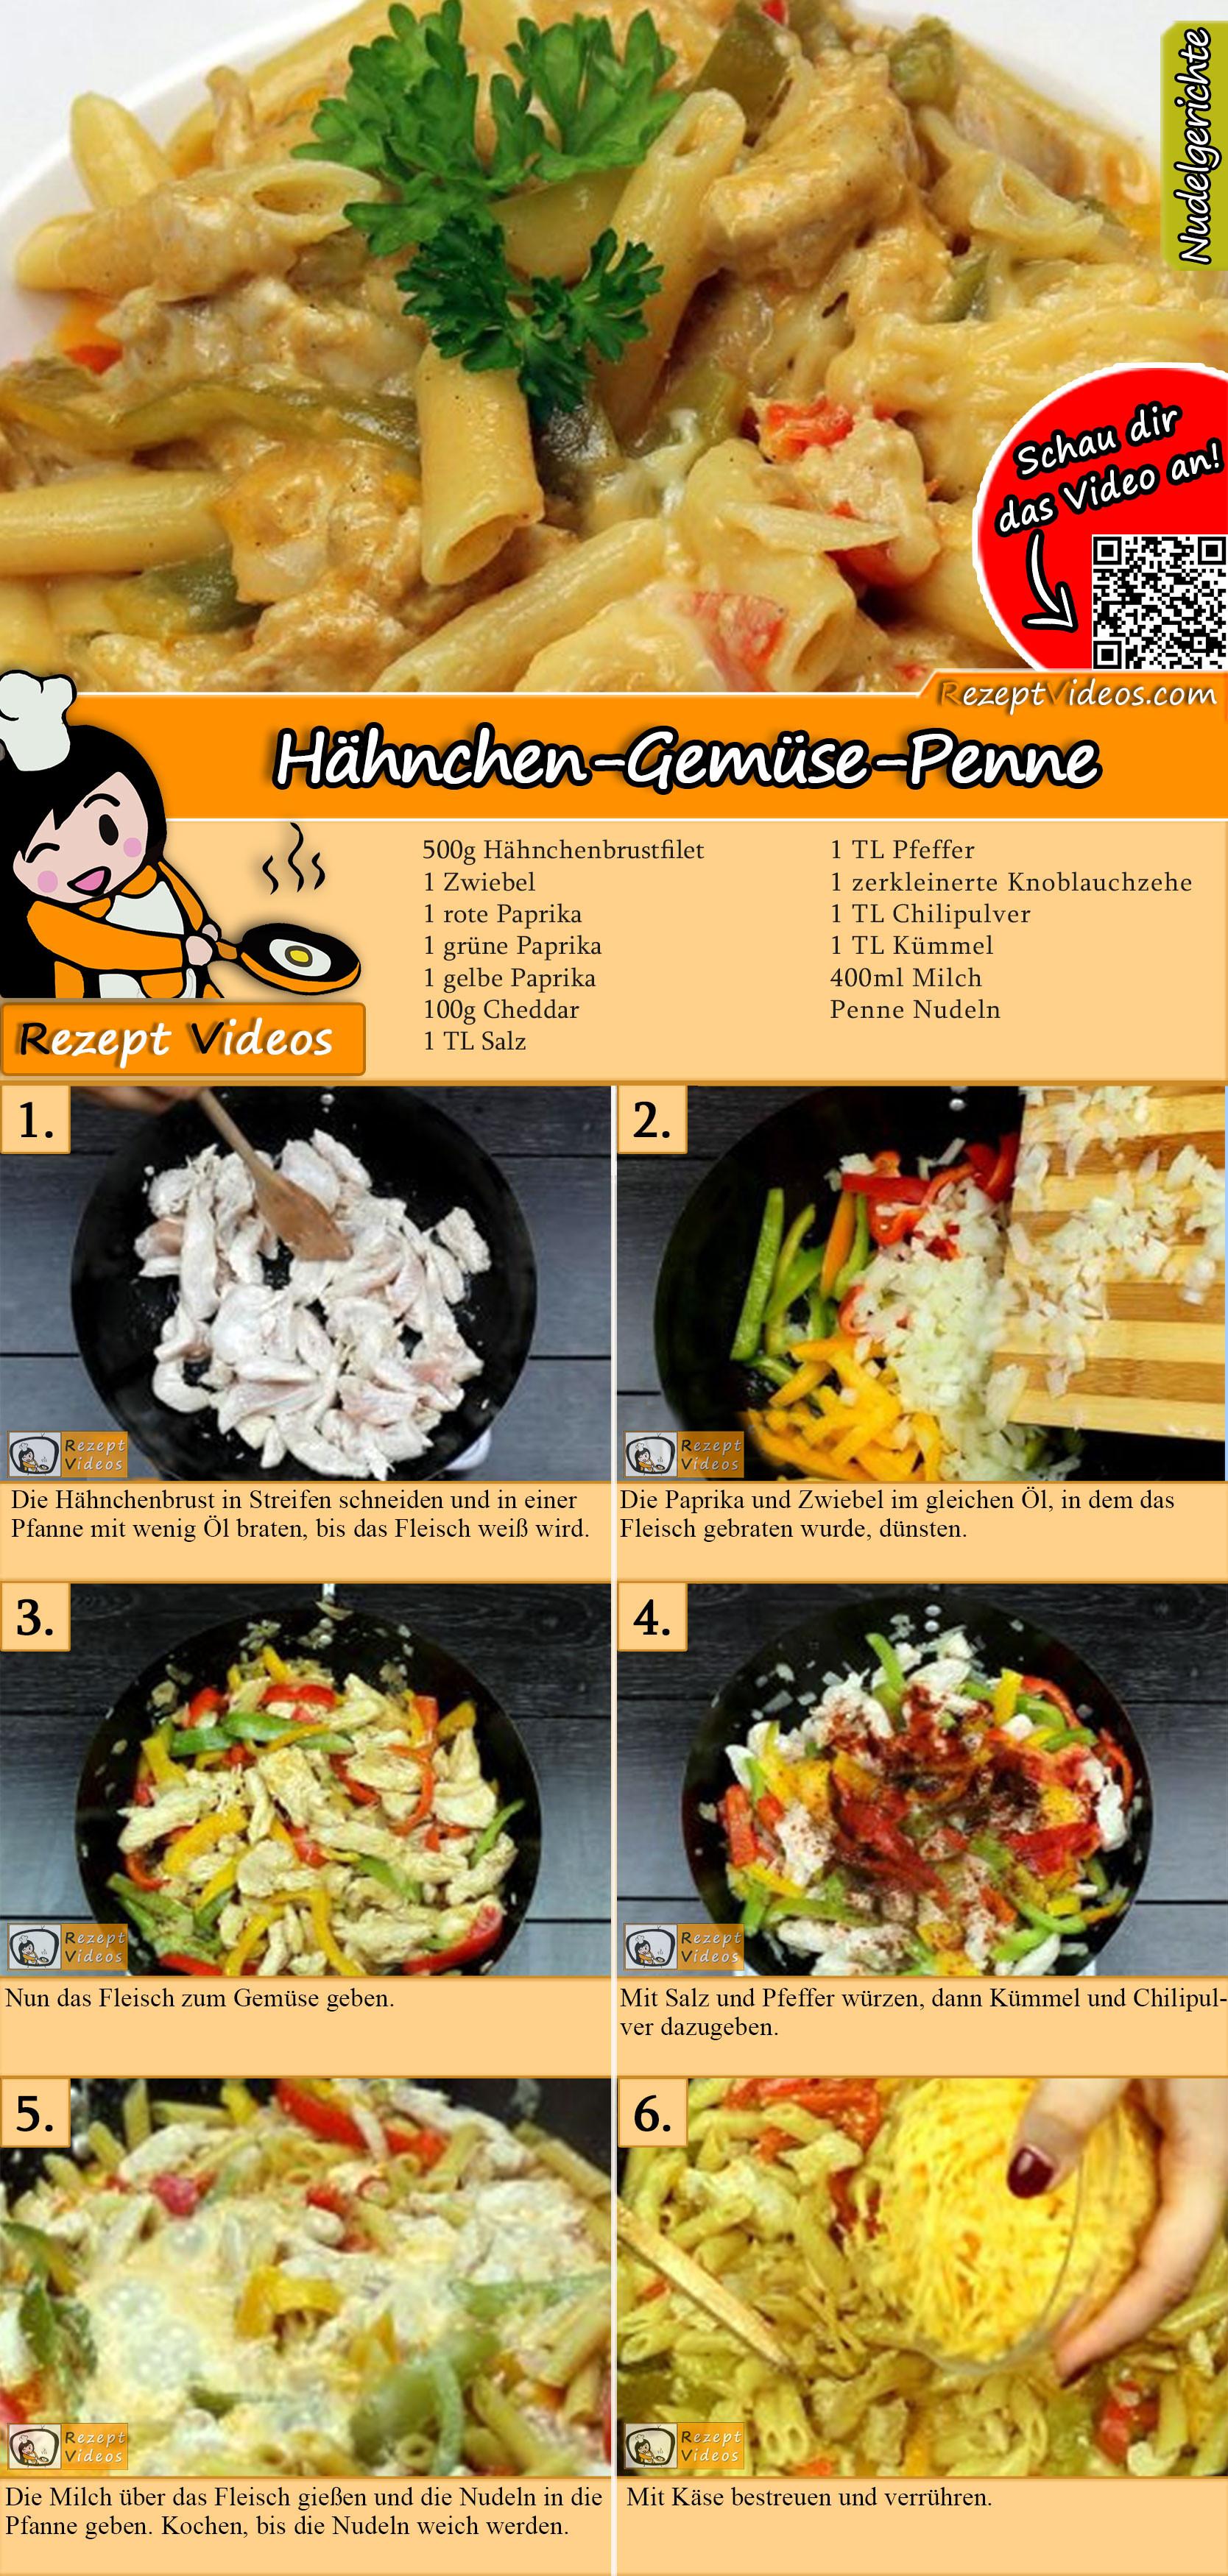 Hähnchen-Gemüse-Penne Rezept mit Video